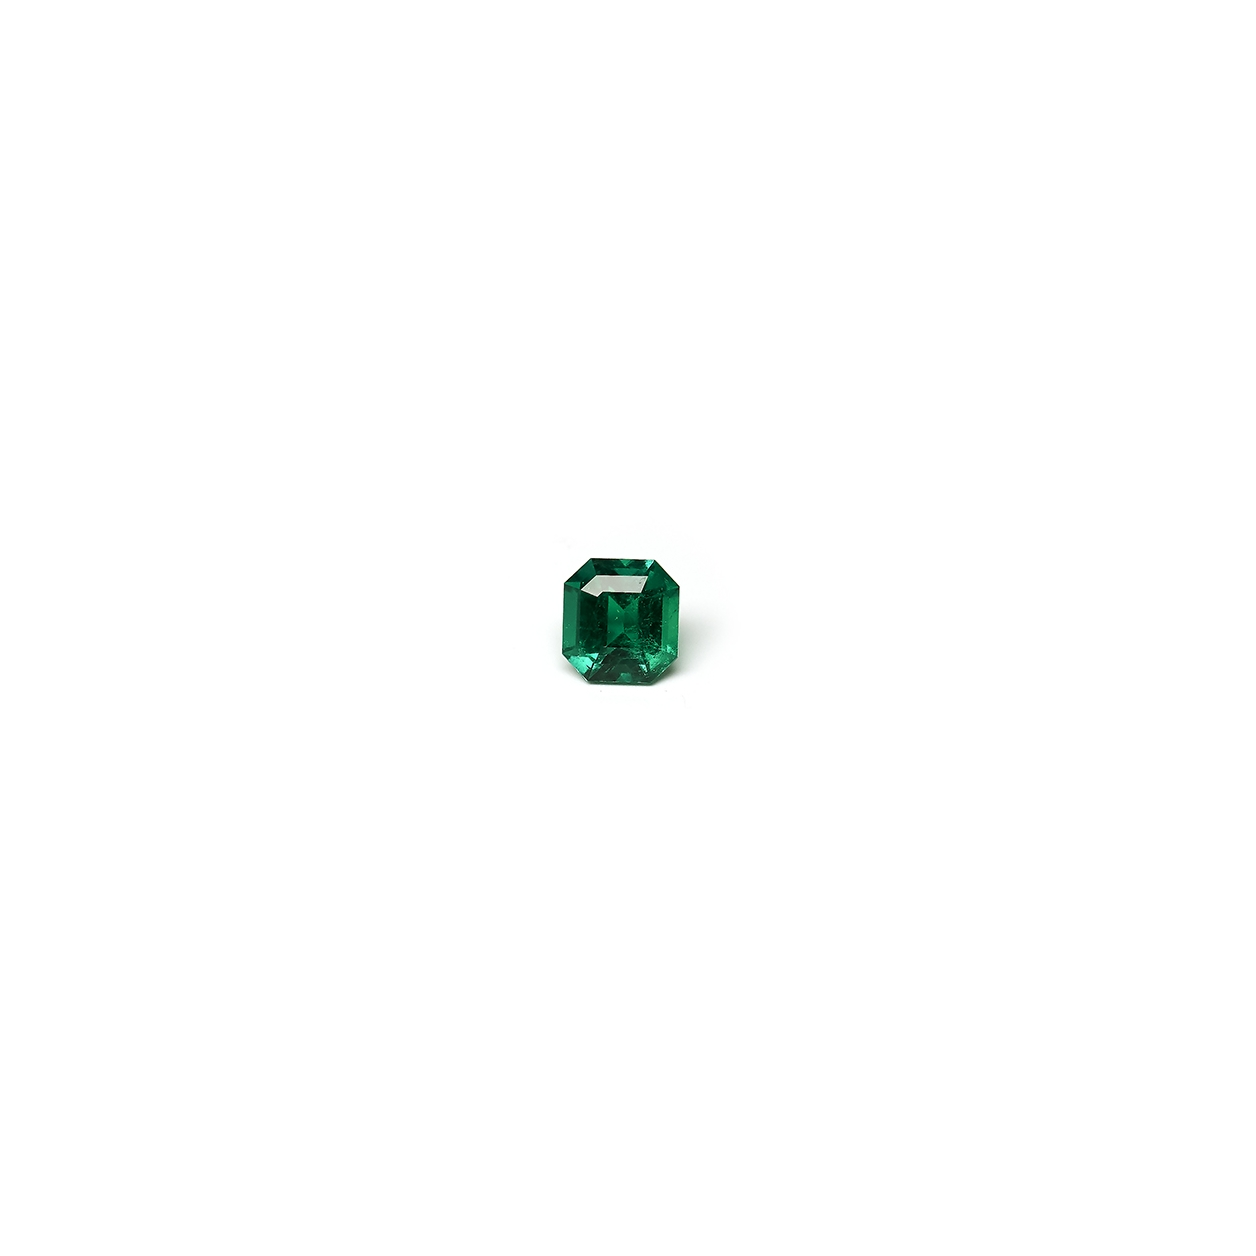 4 carat emerald cut